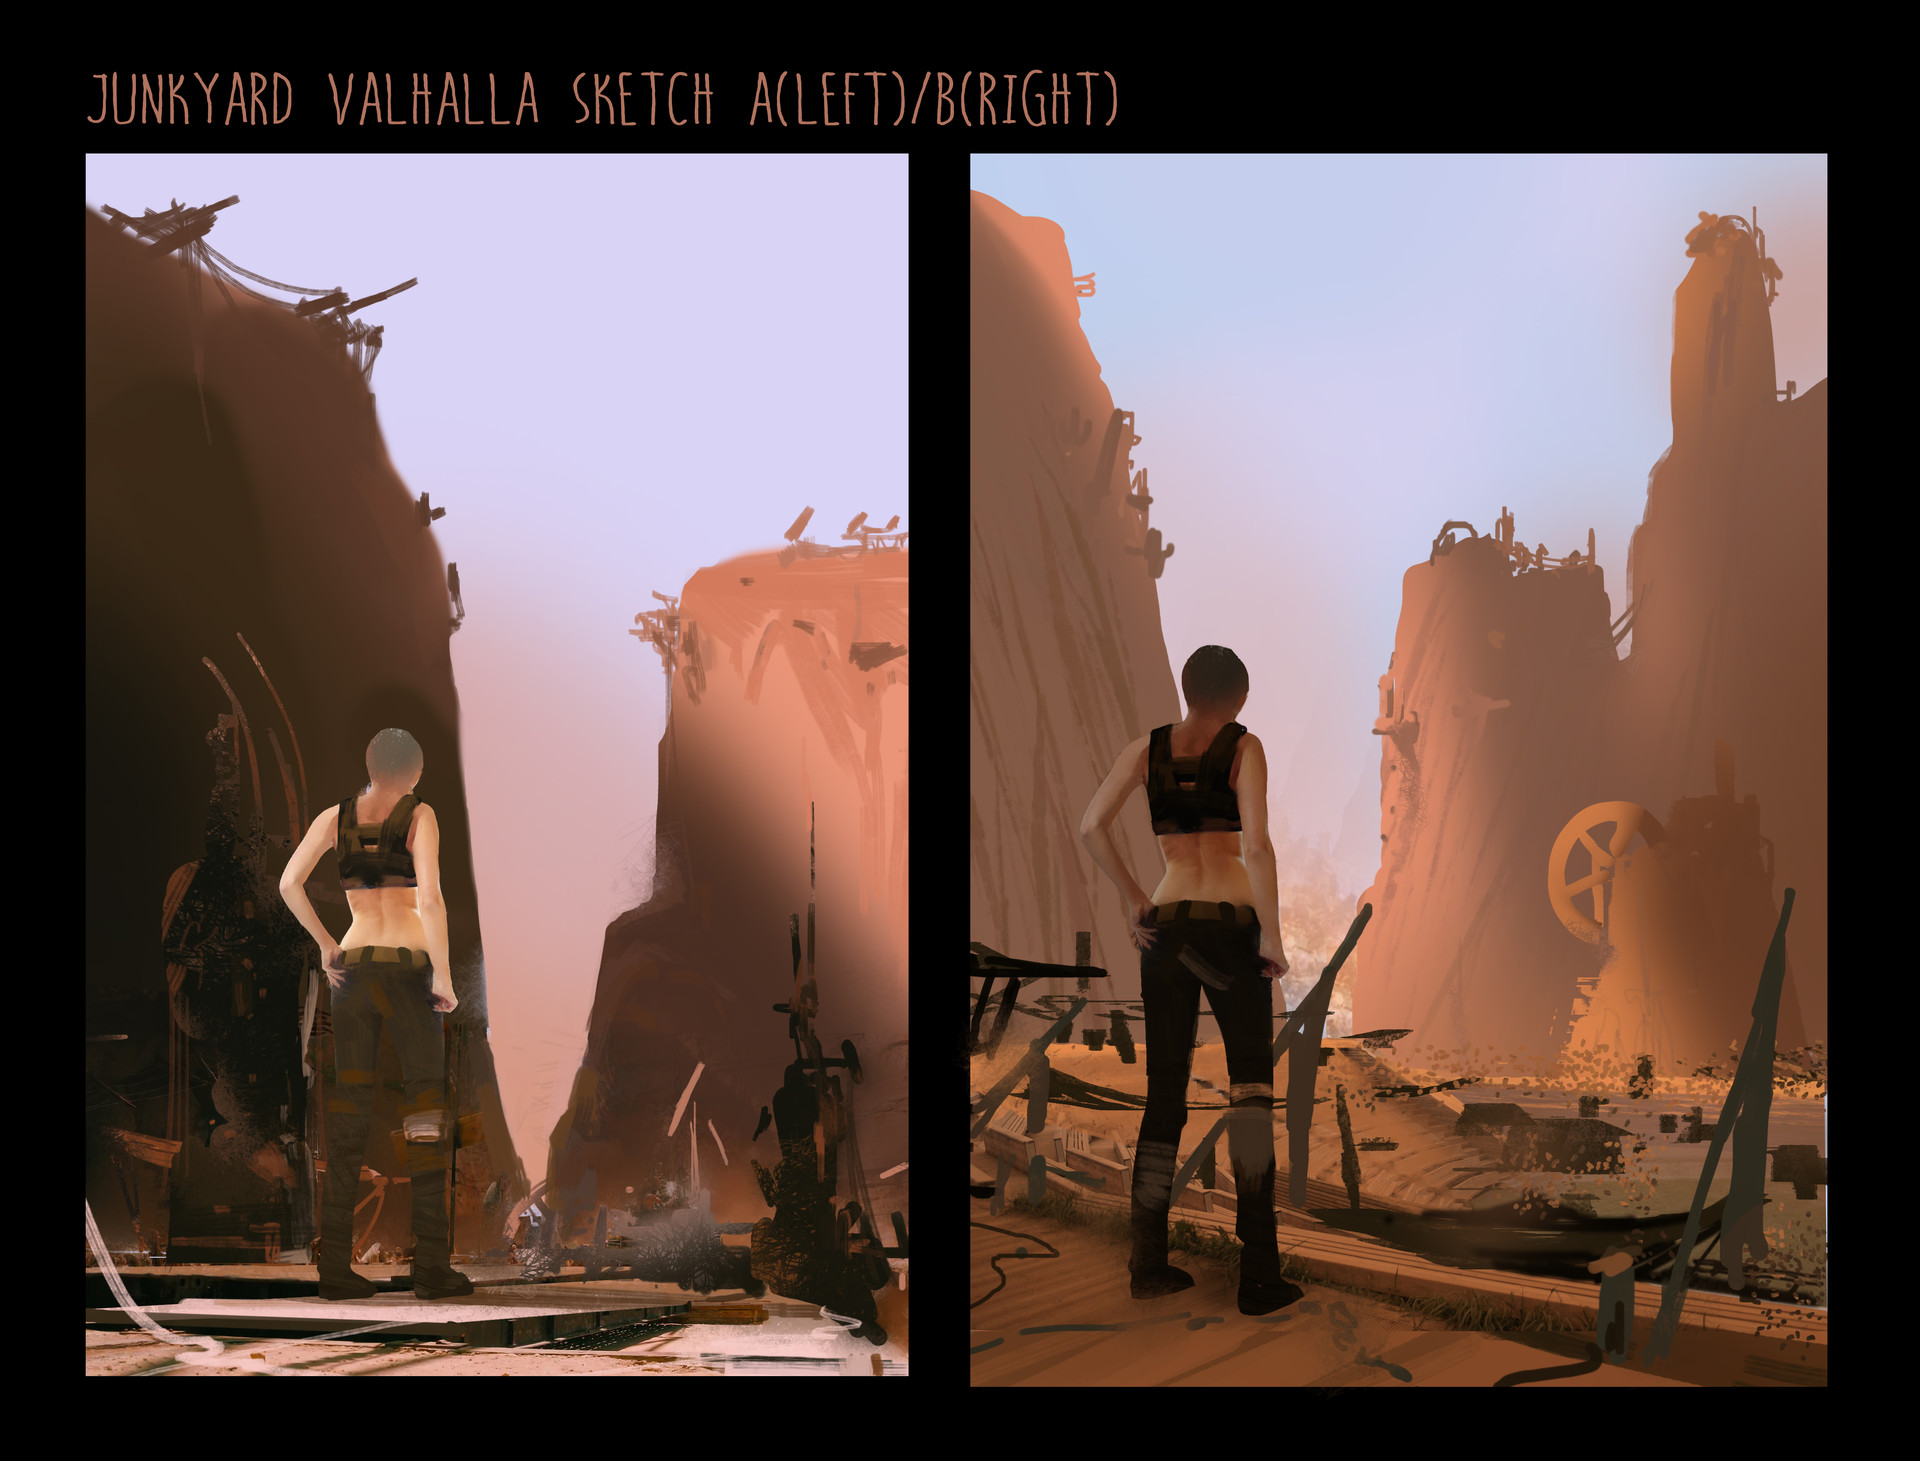 Yujin choo junkyard valhalla sketch02